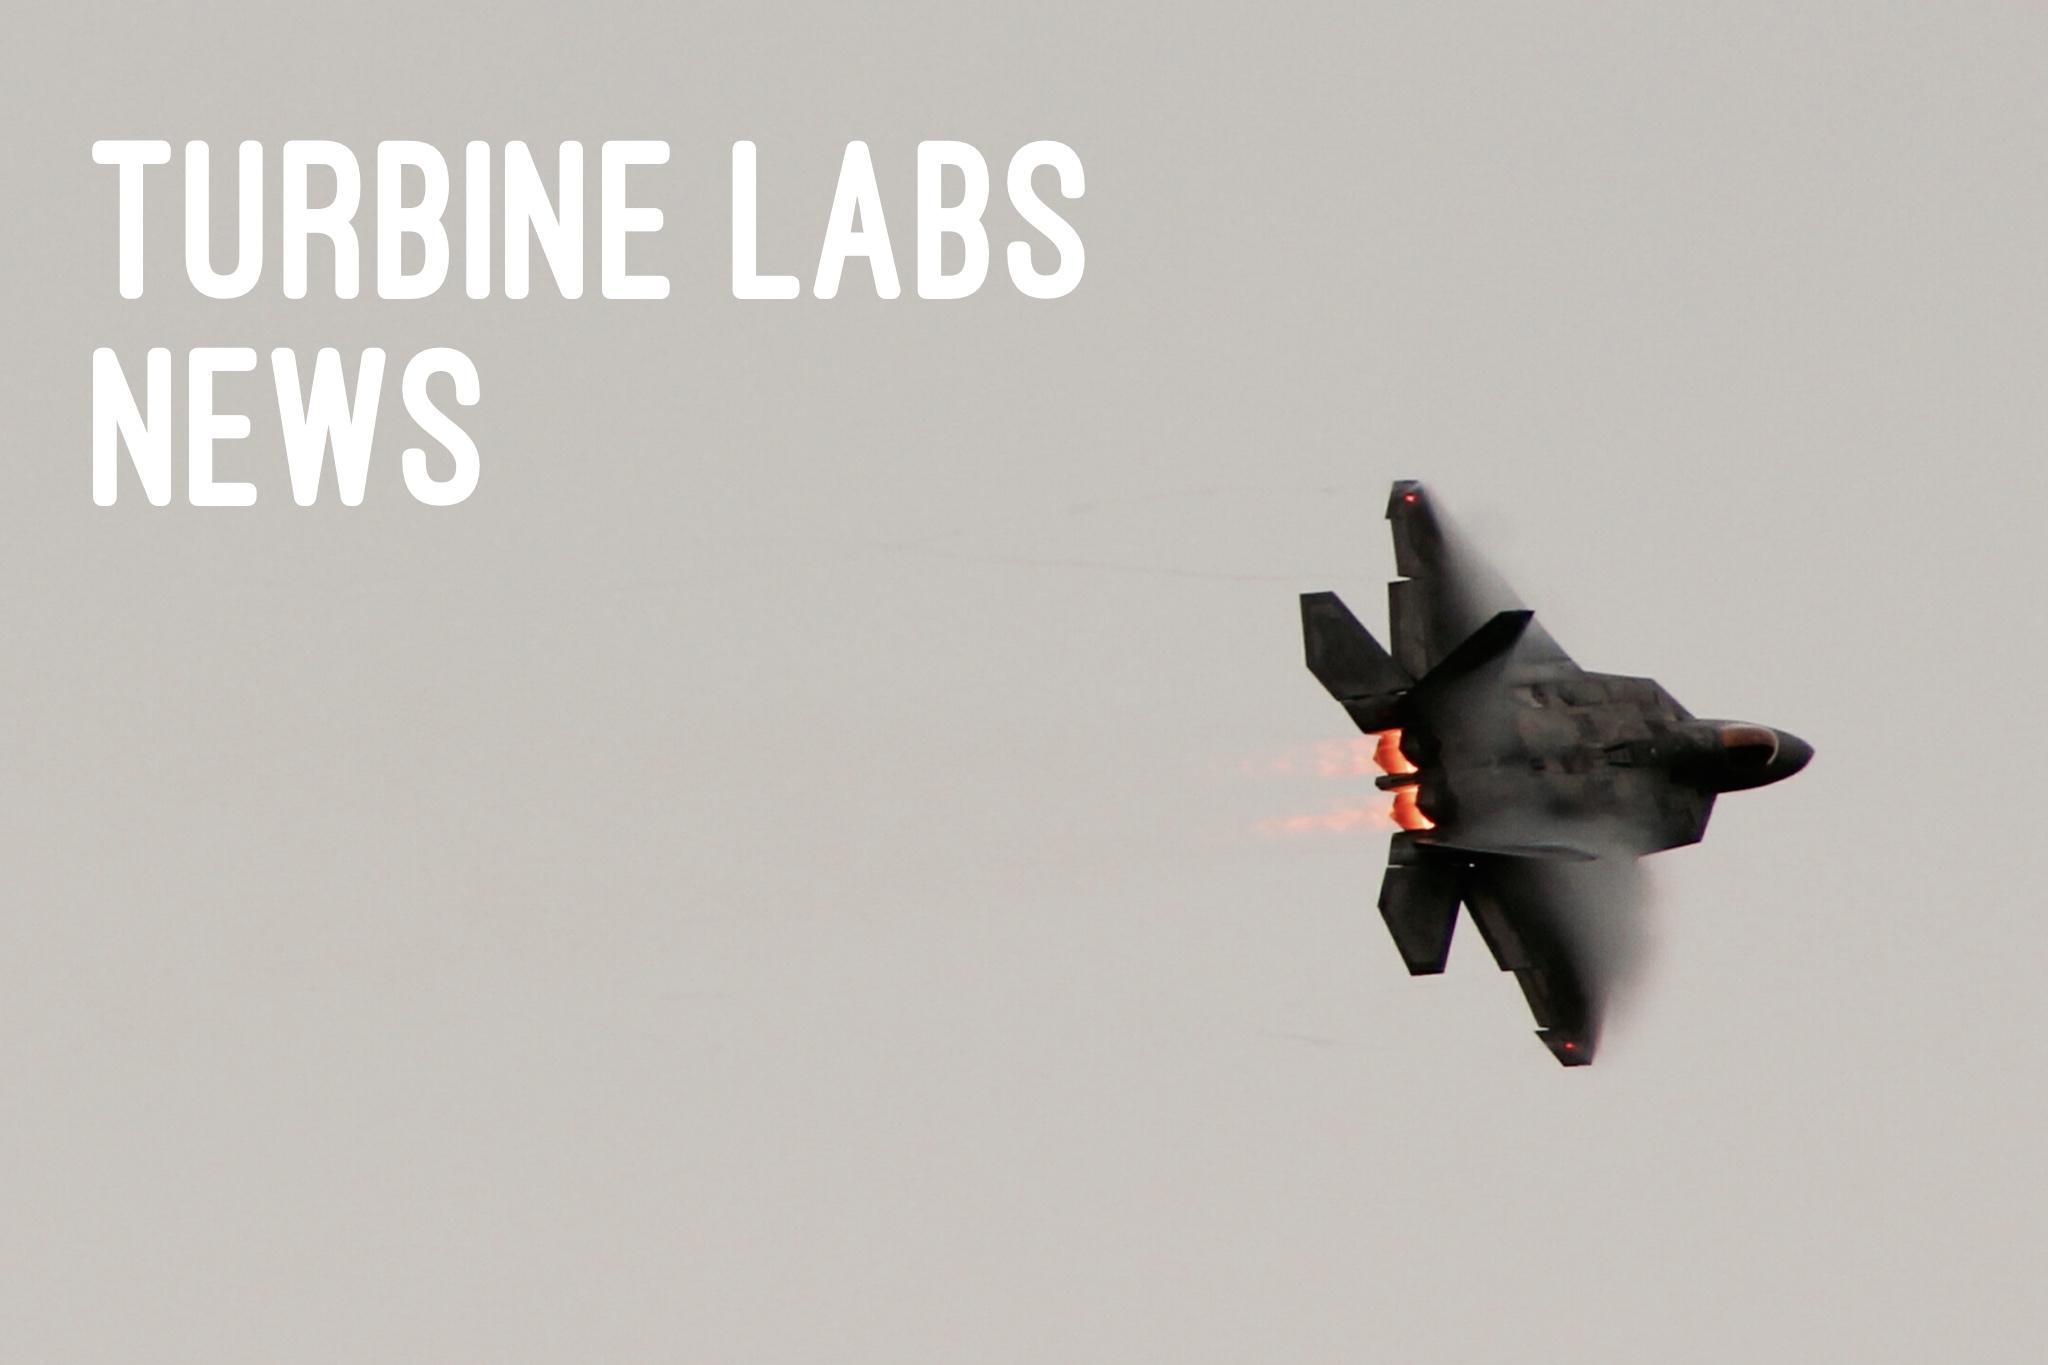 turbine-labs-news-release.jpg